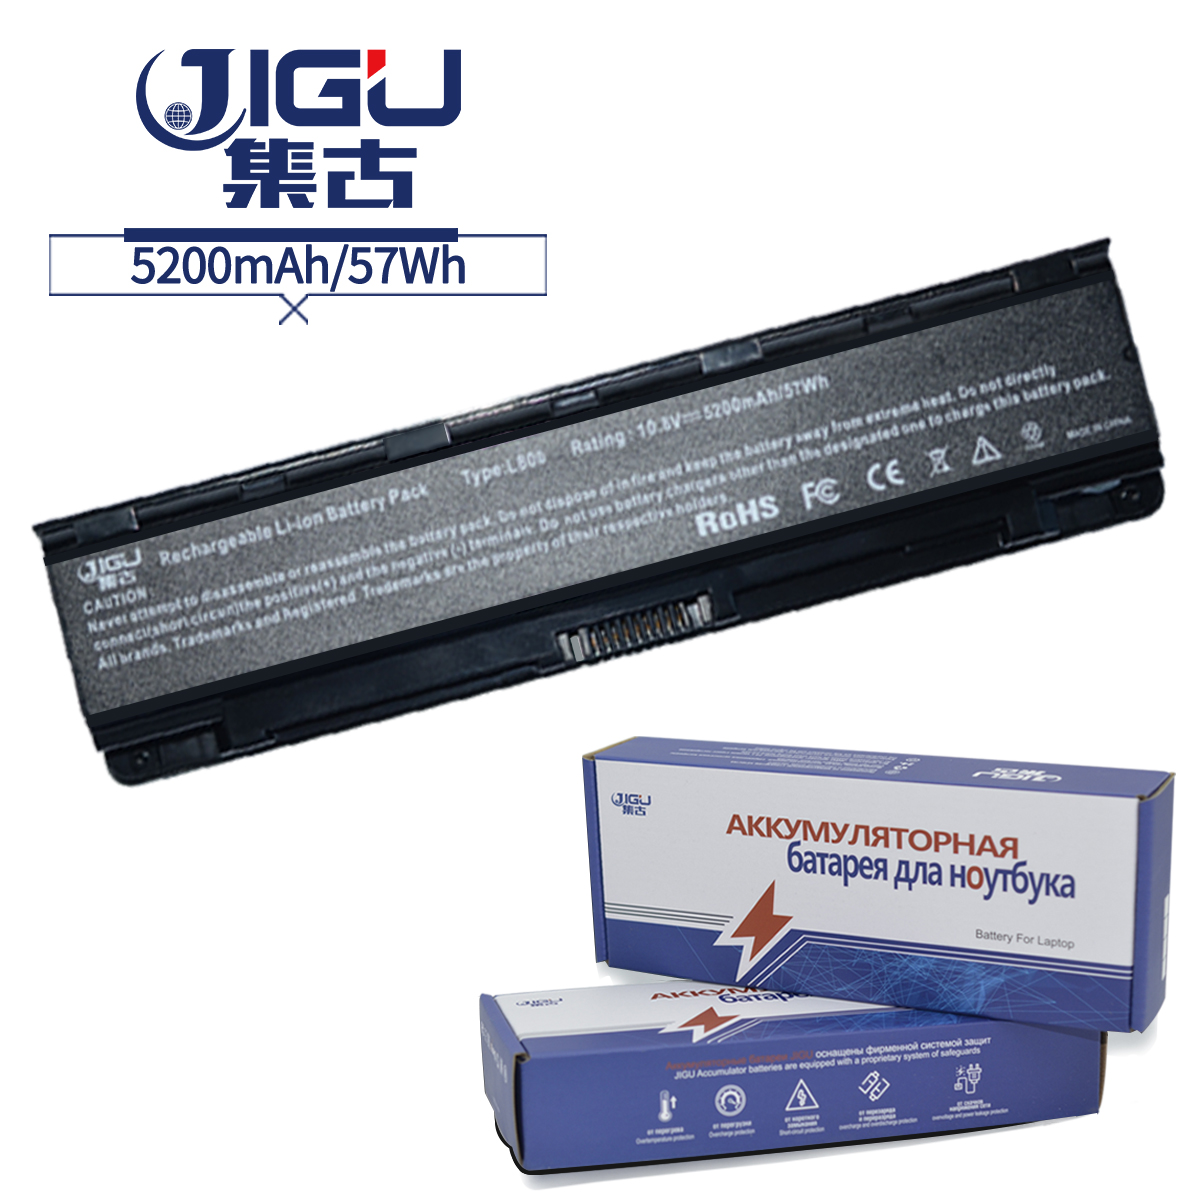 DRIVERS TOSHIBA SATELLITE PRO C660-1J4